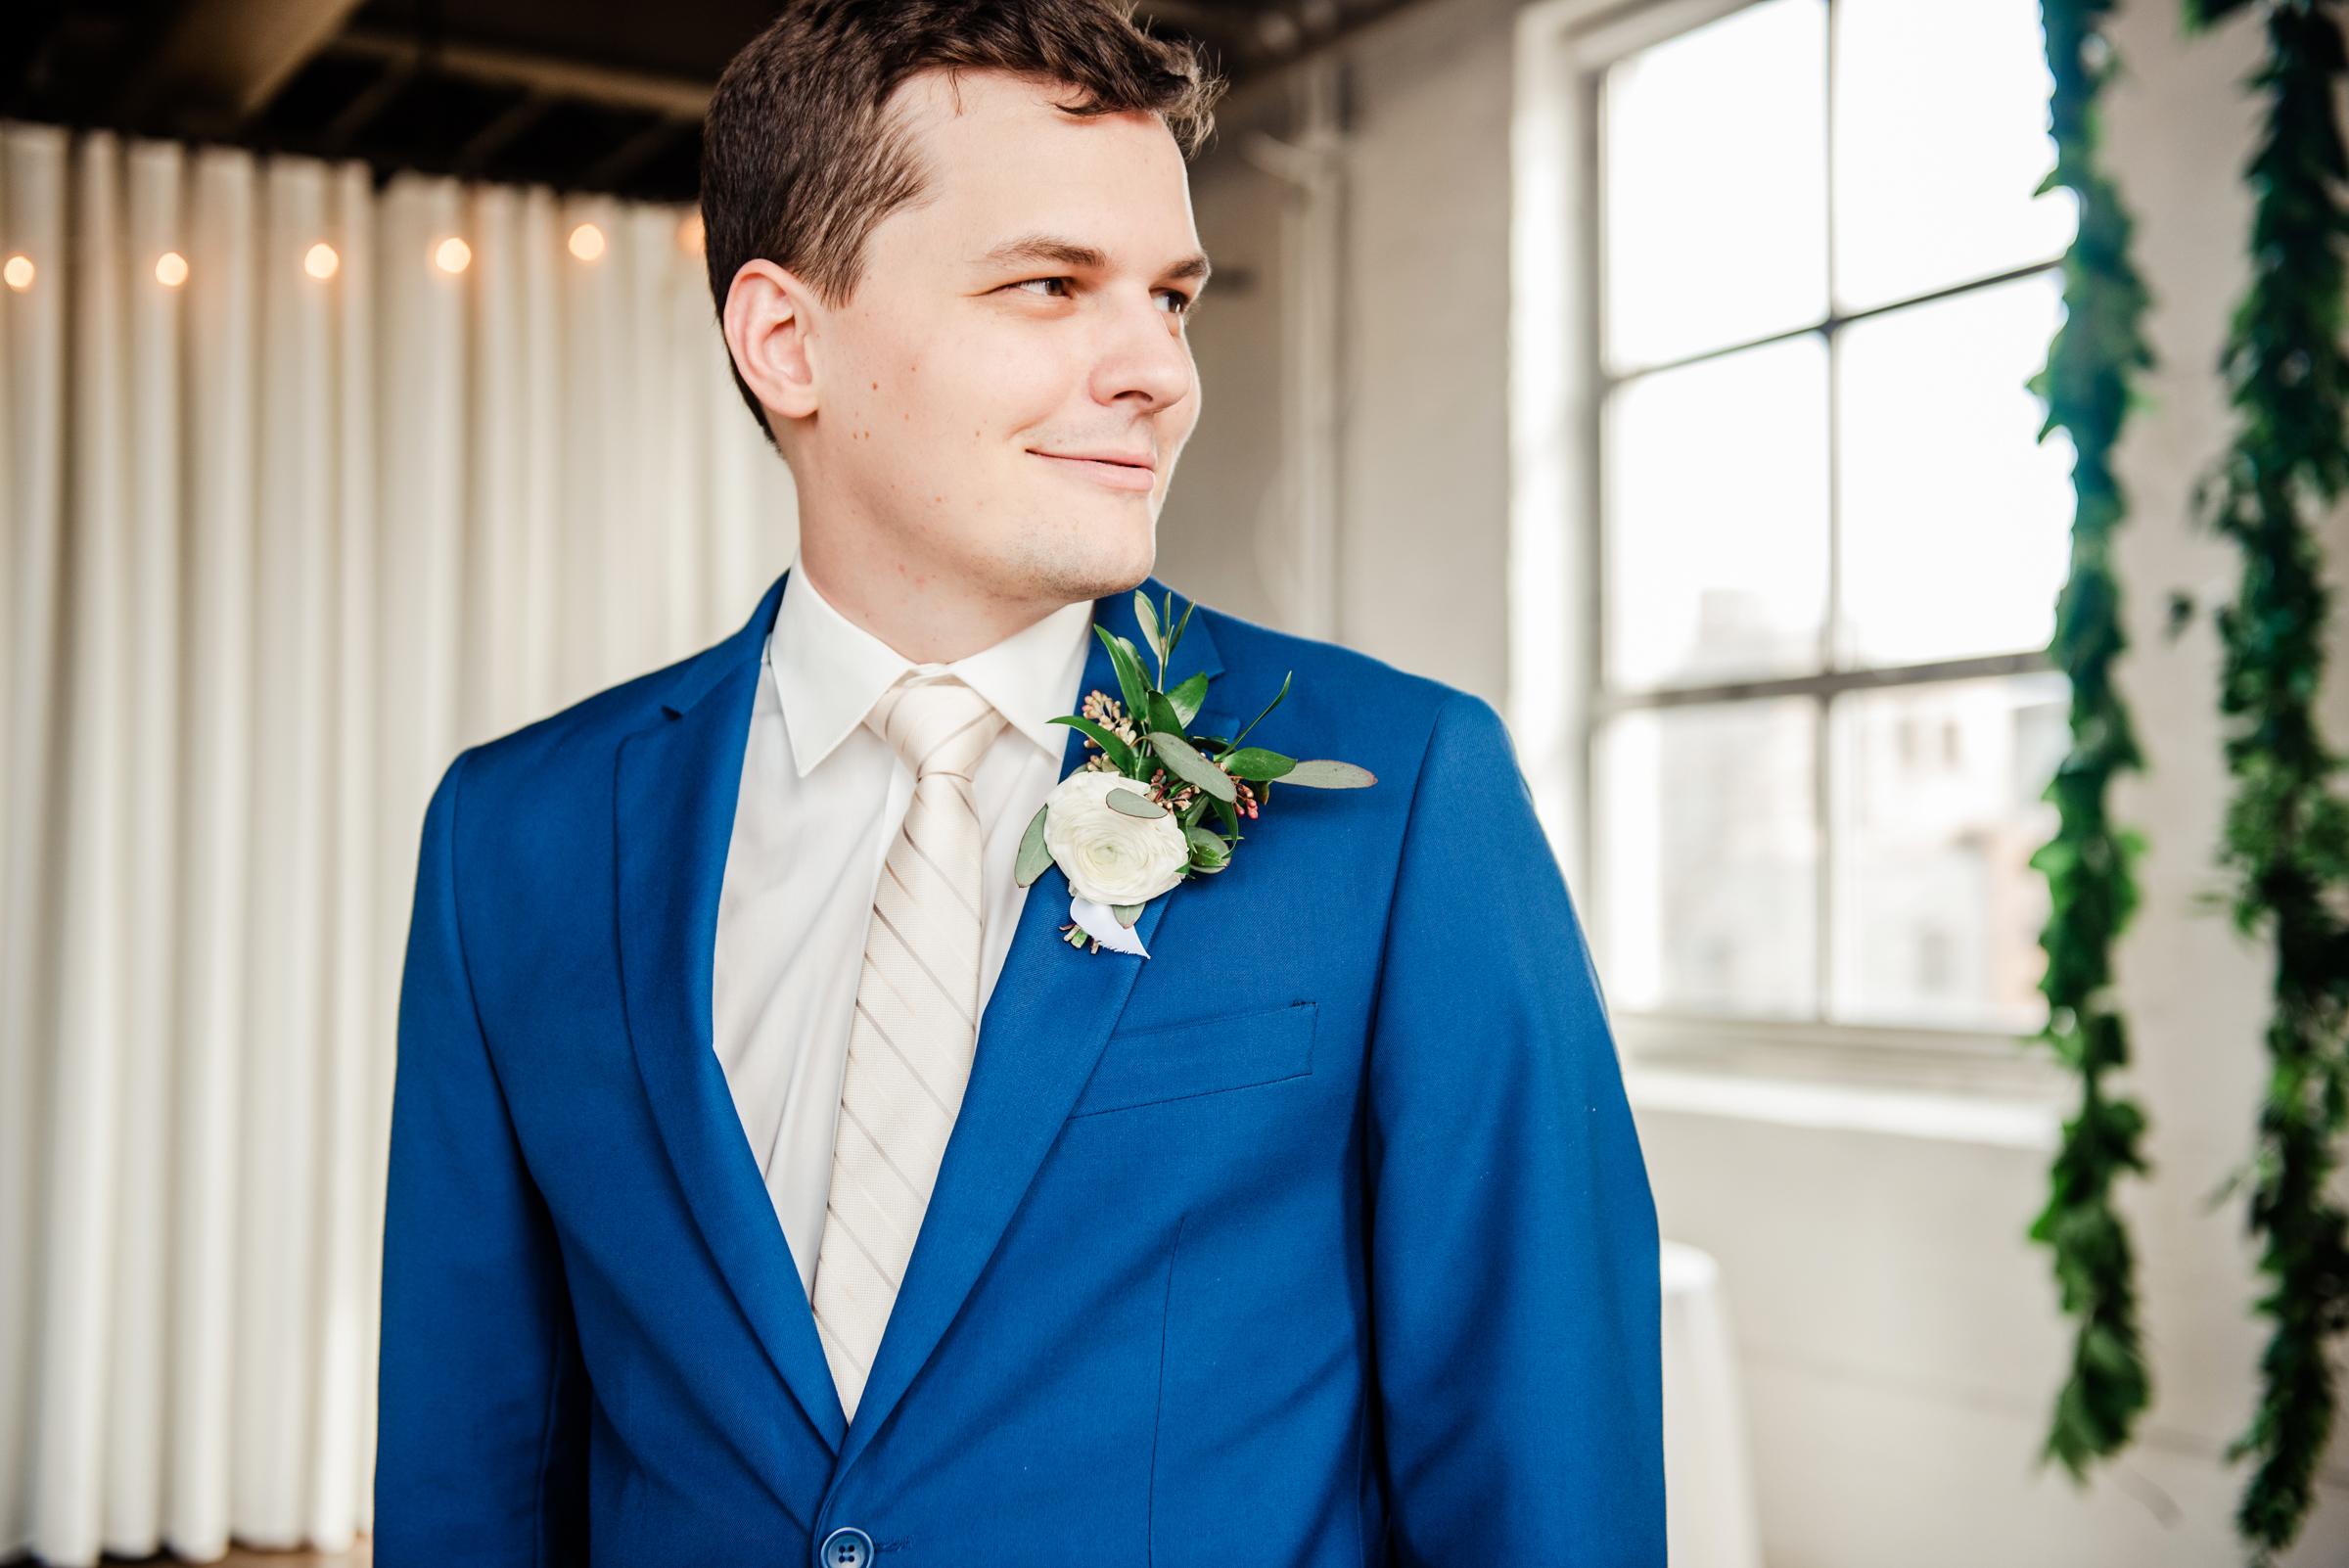 The_Arbor_LoftRochester_Wedding_JILL_STUDIO_Rochester_NY_Photographer_161556.jpg